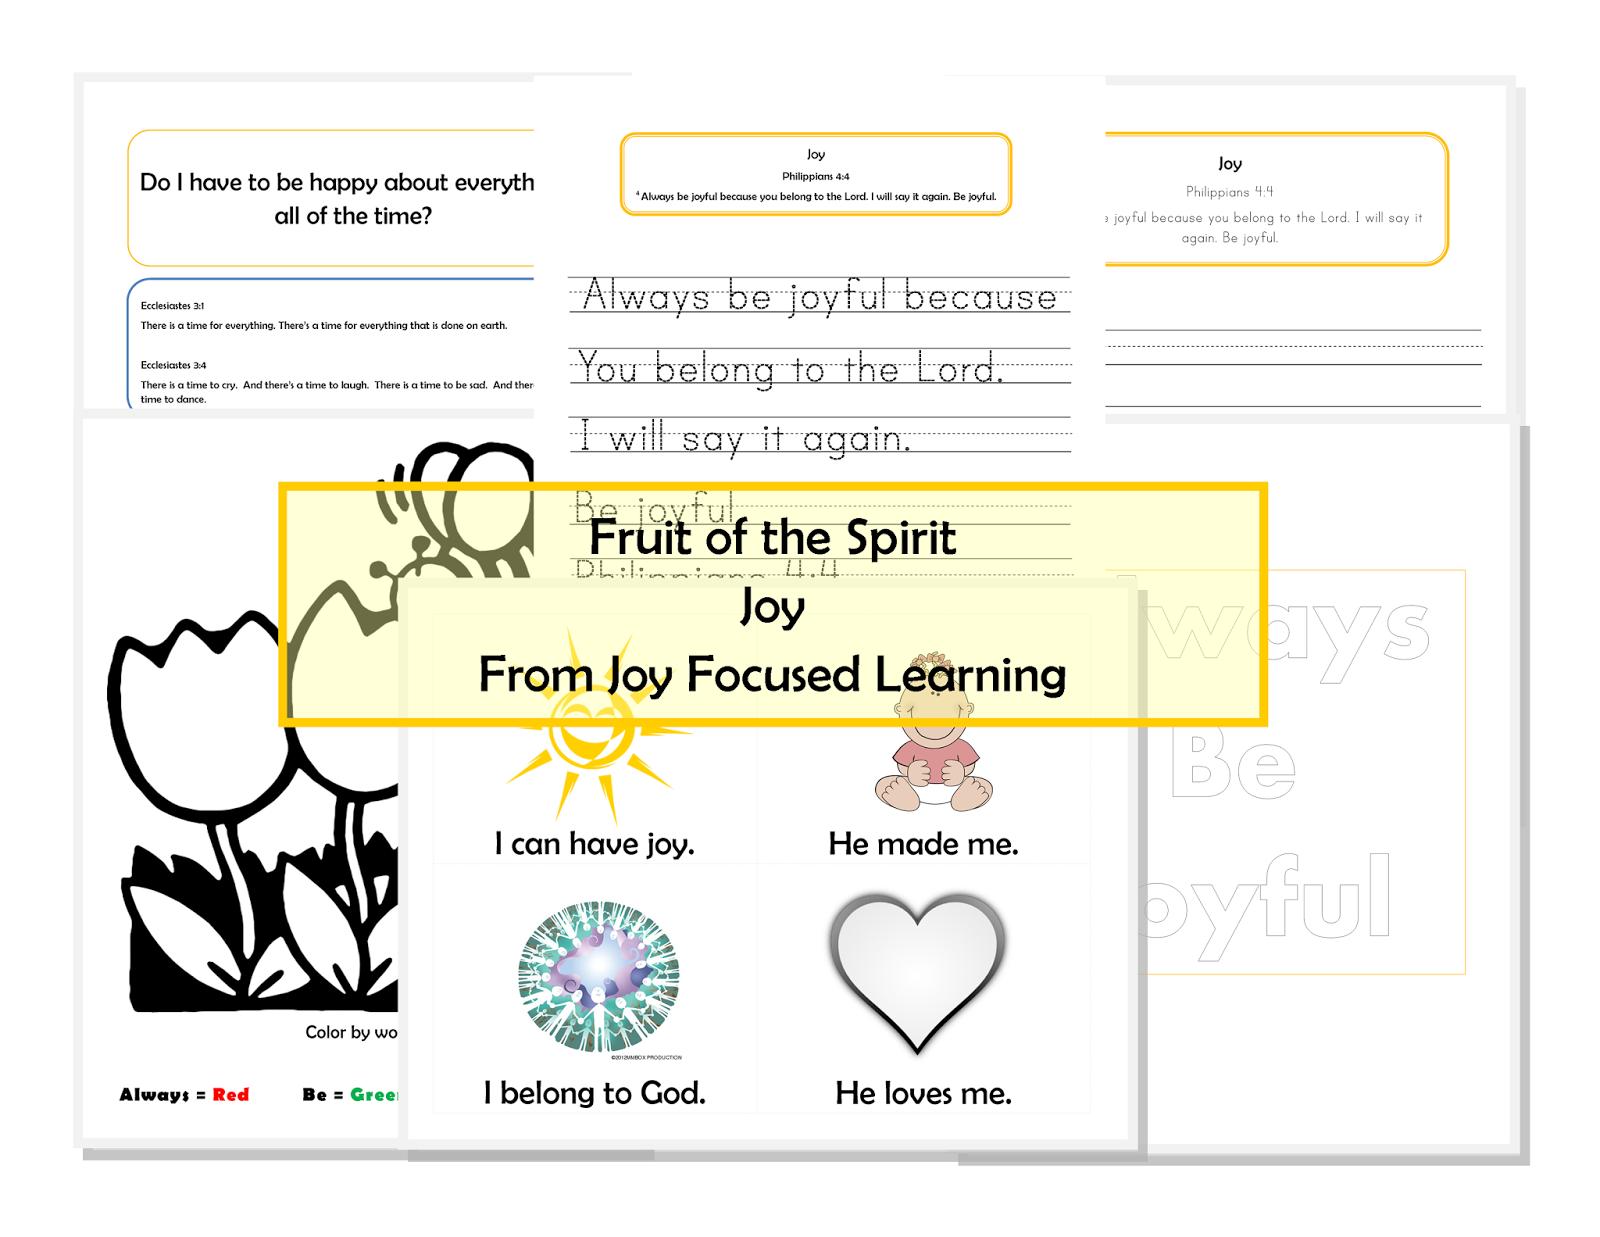 Joy Focused Learning Fruit Of The Spirit Series Joy